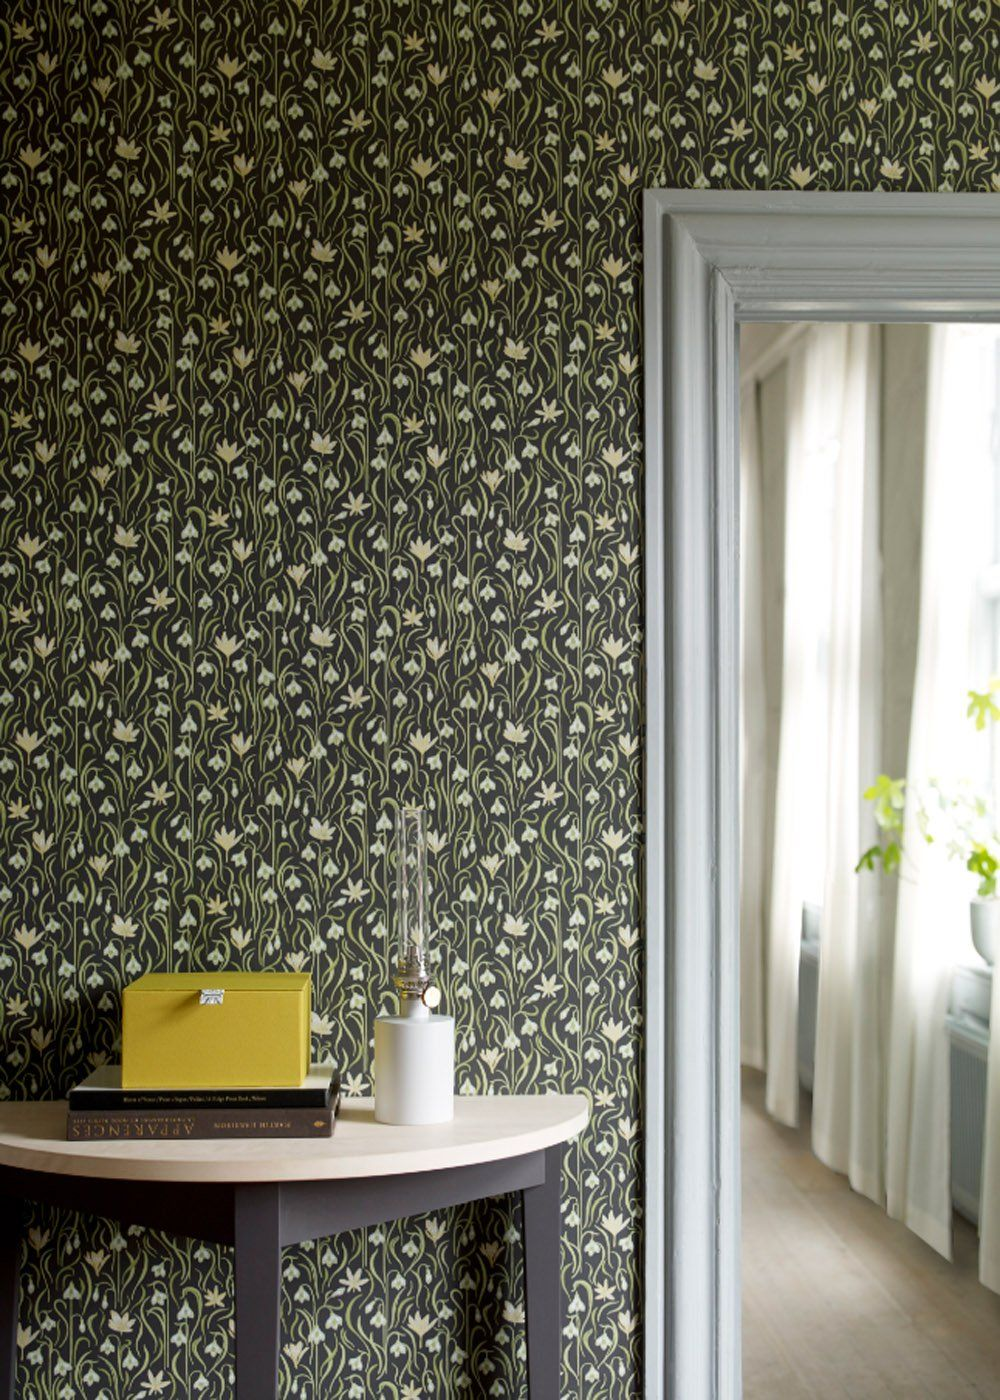 inspiration le papier peint fleuri ou a motif vegetal